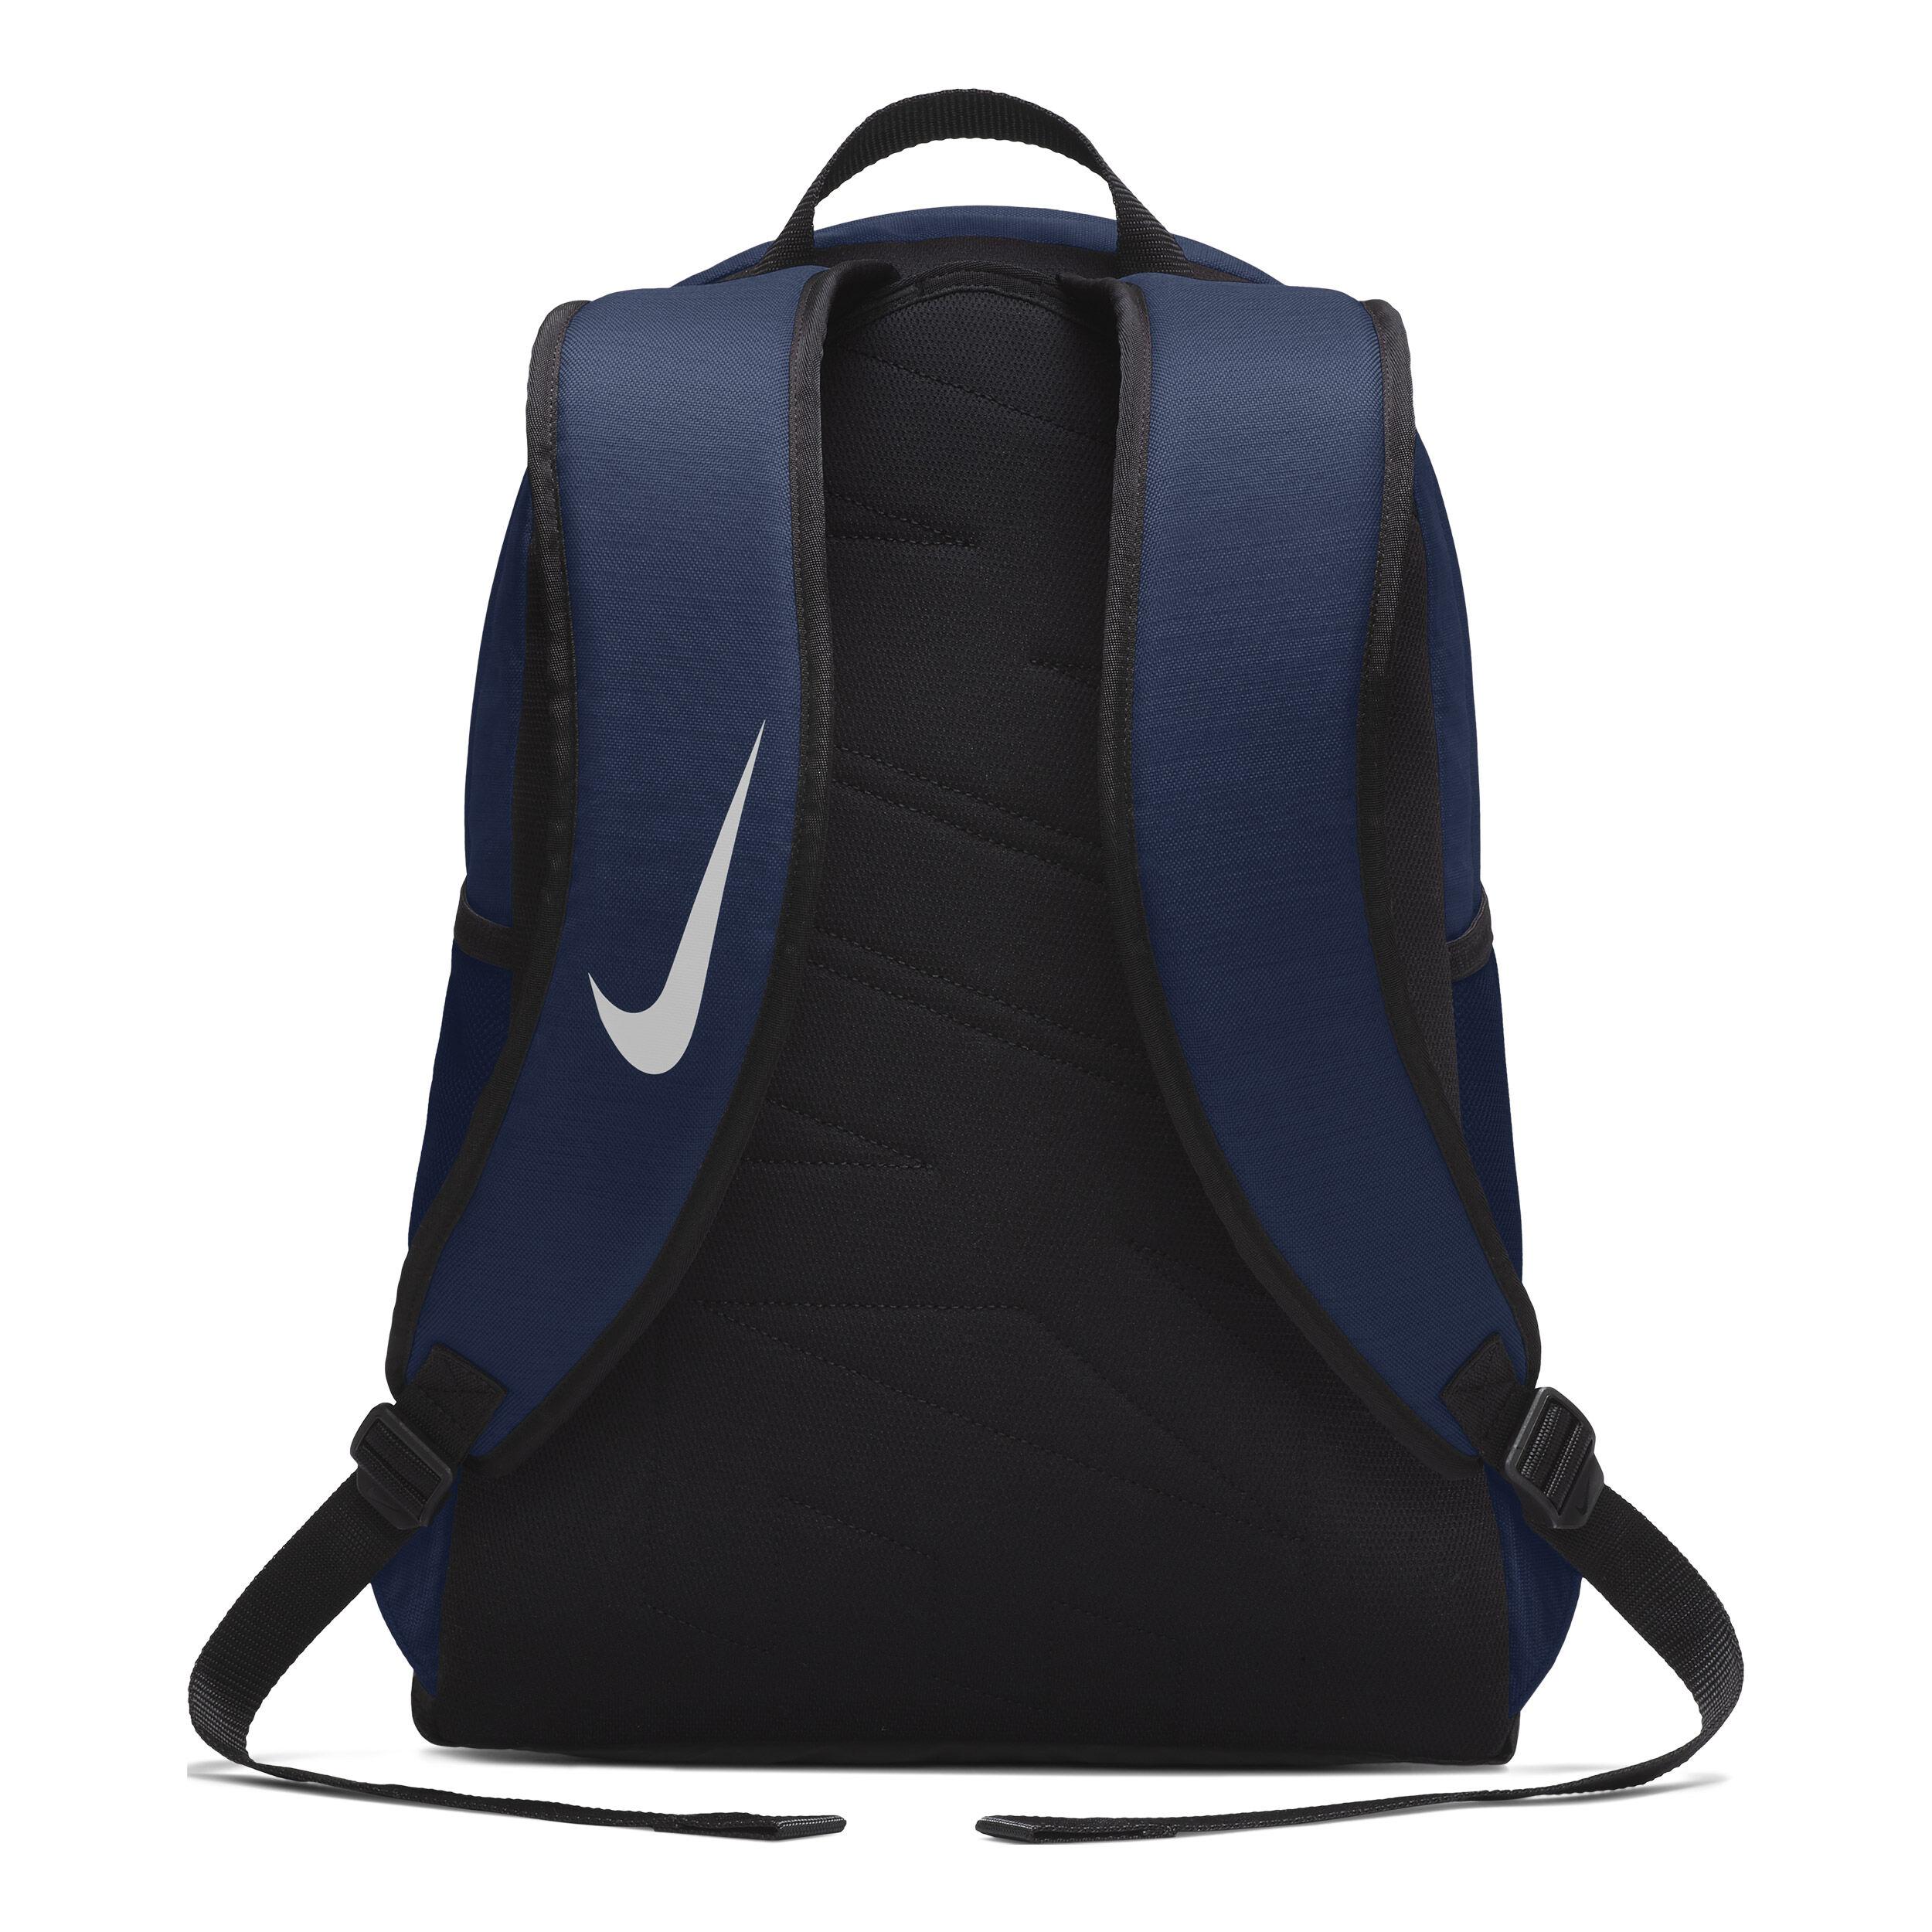 Mochila Nike Medio Brasilia OscuroNegro Training Azul lFK13TJc